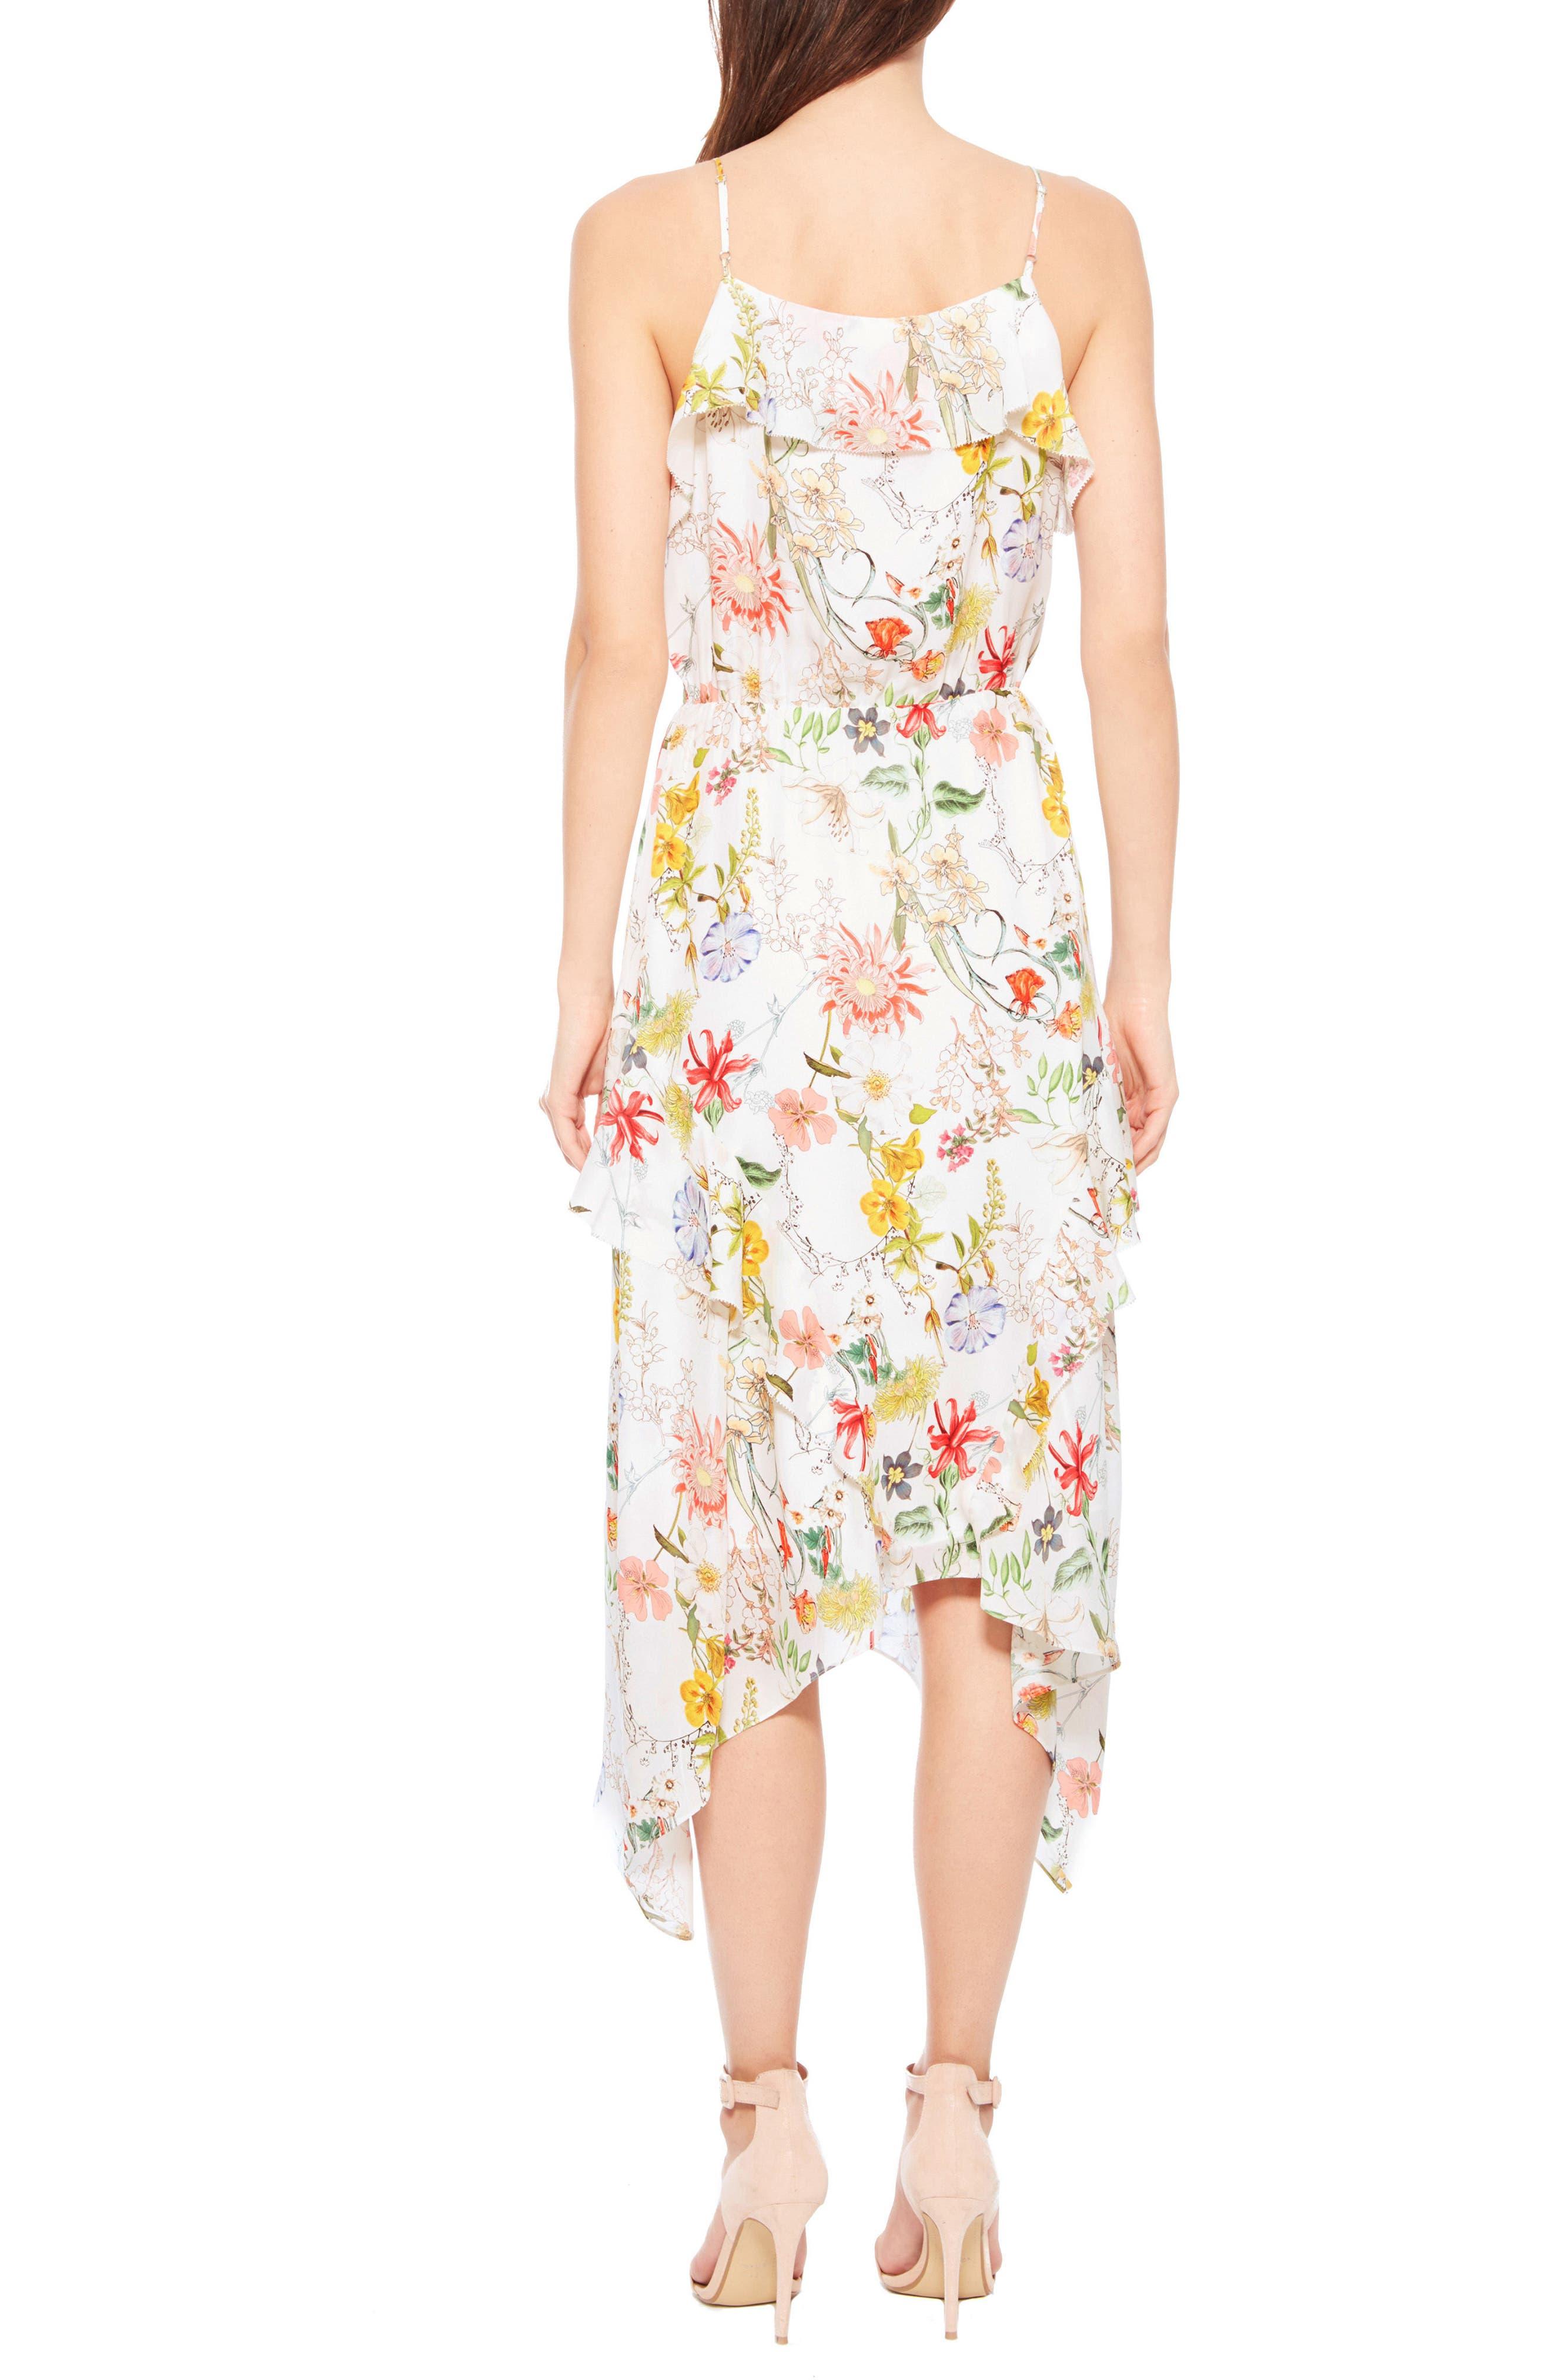 Vanna Dress,                             Alternate thumbnail 2, color,                             908